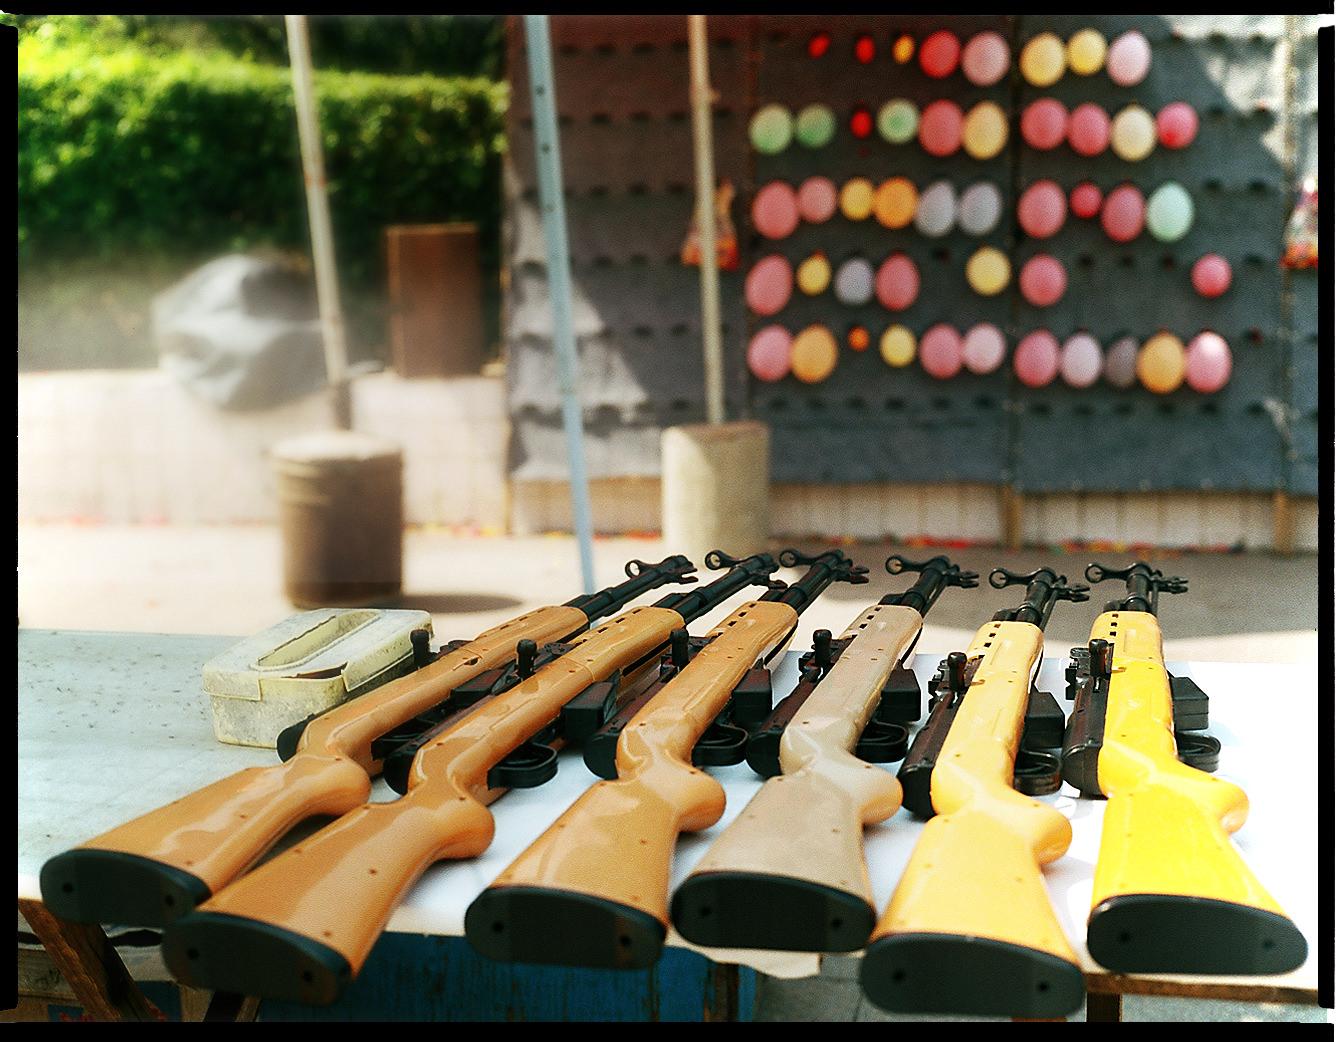 MediumFormatPatrikWallner_Qingyuan_ShootingGunsLOWQ